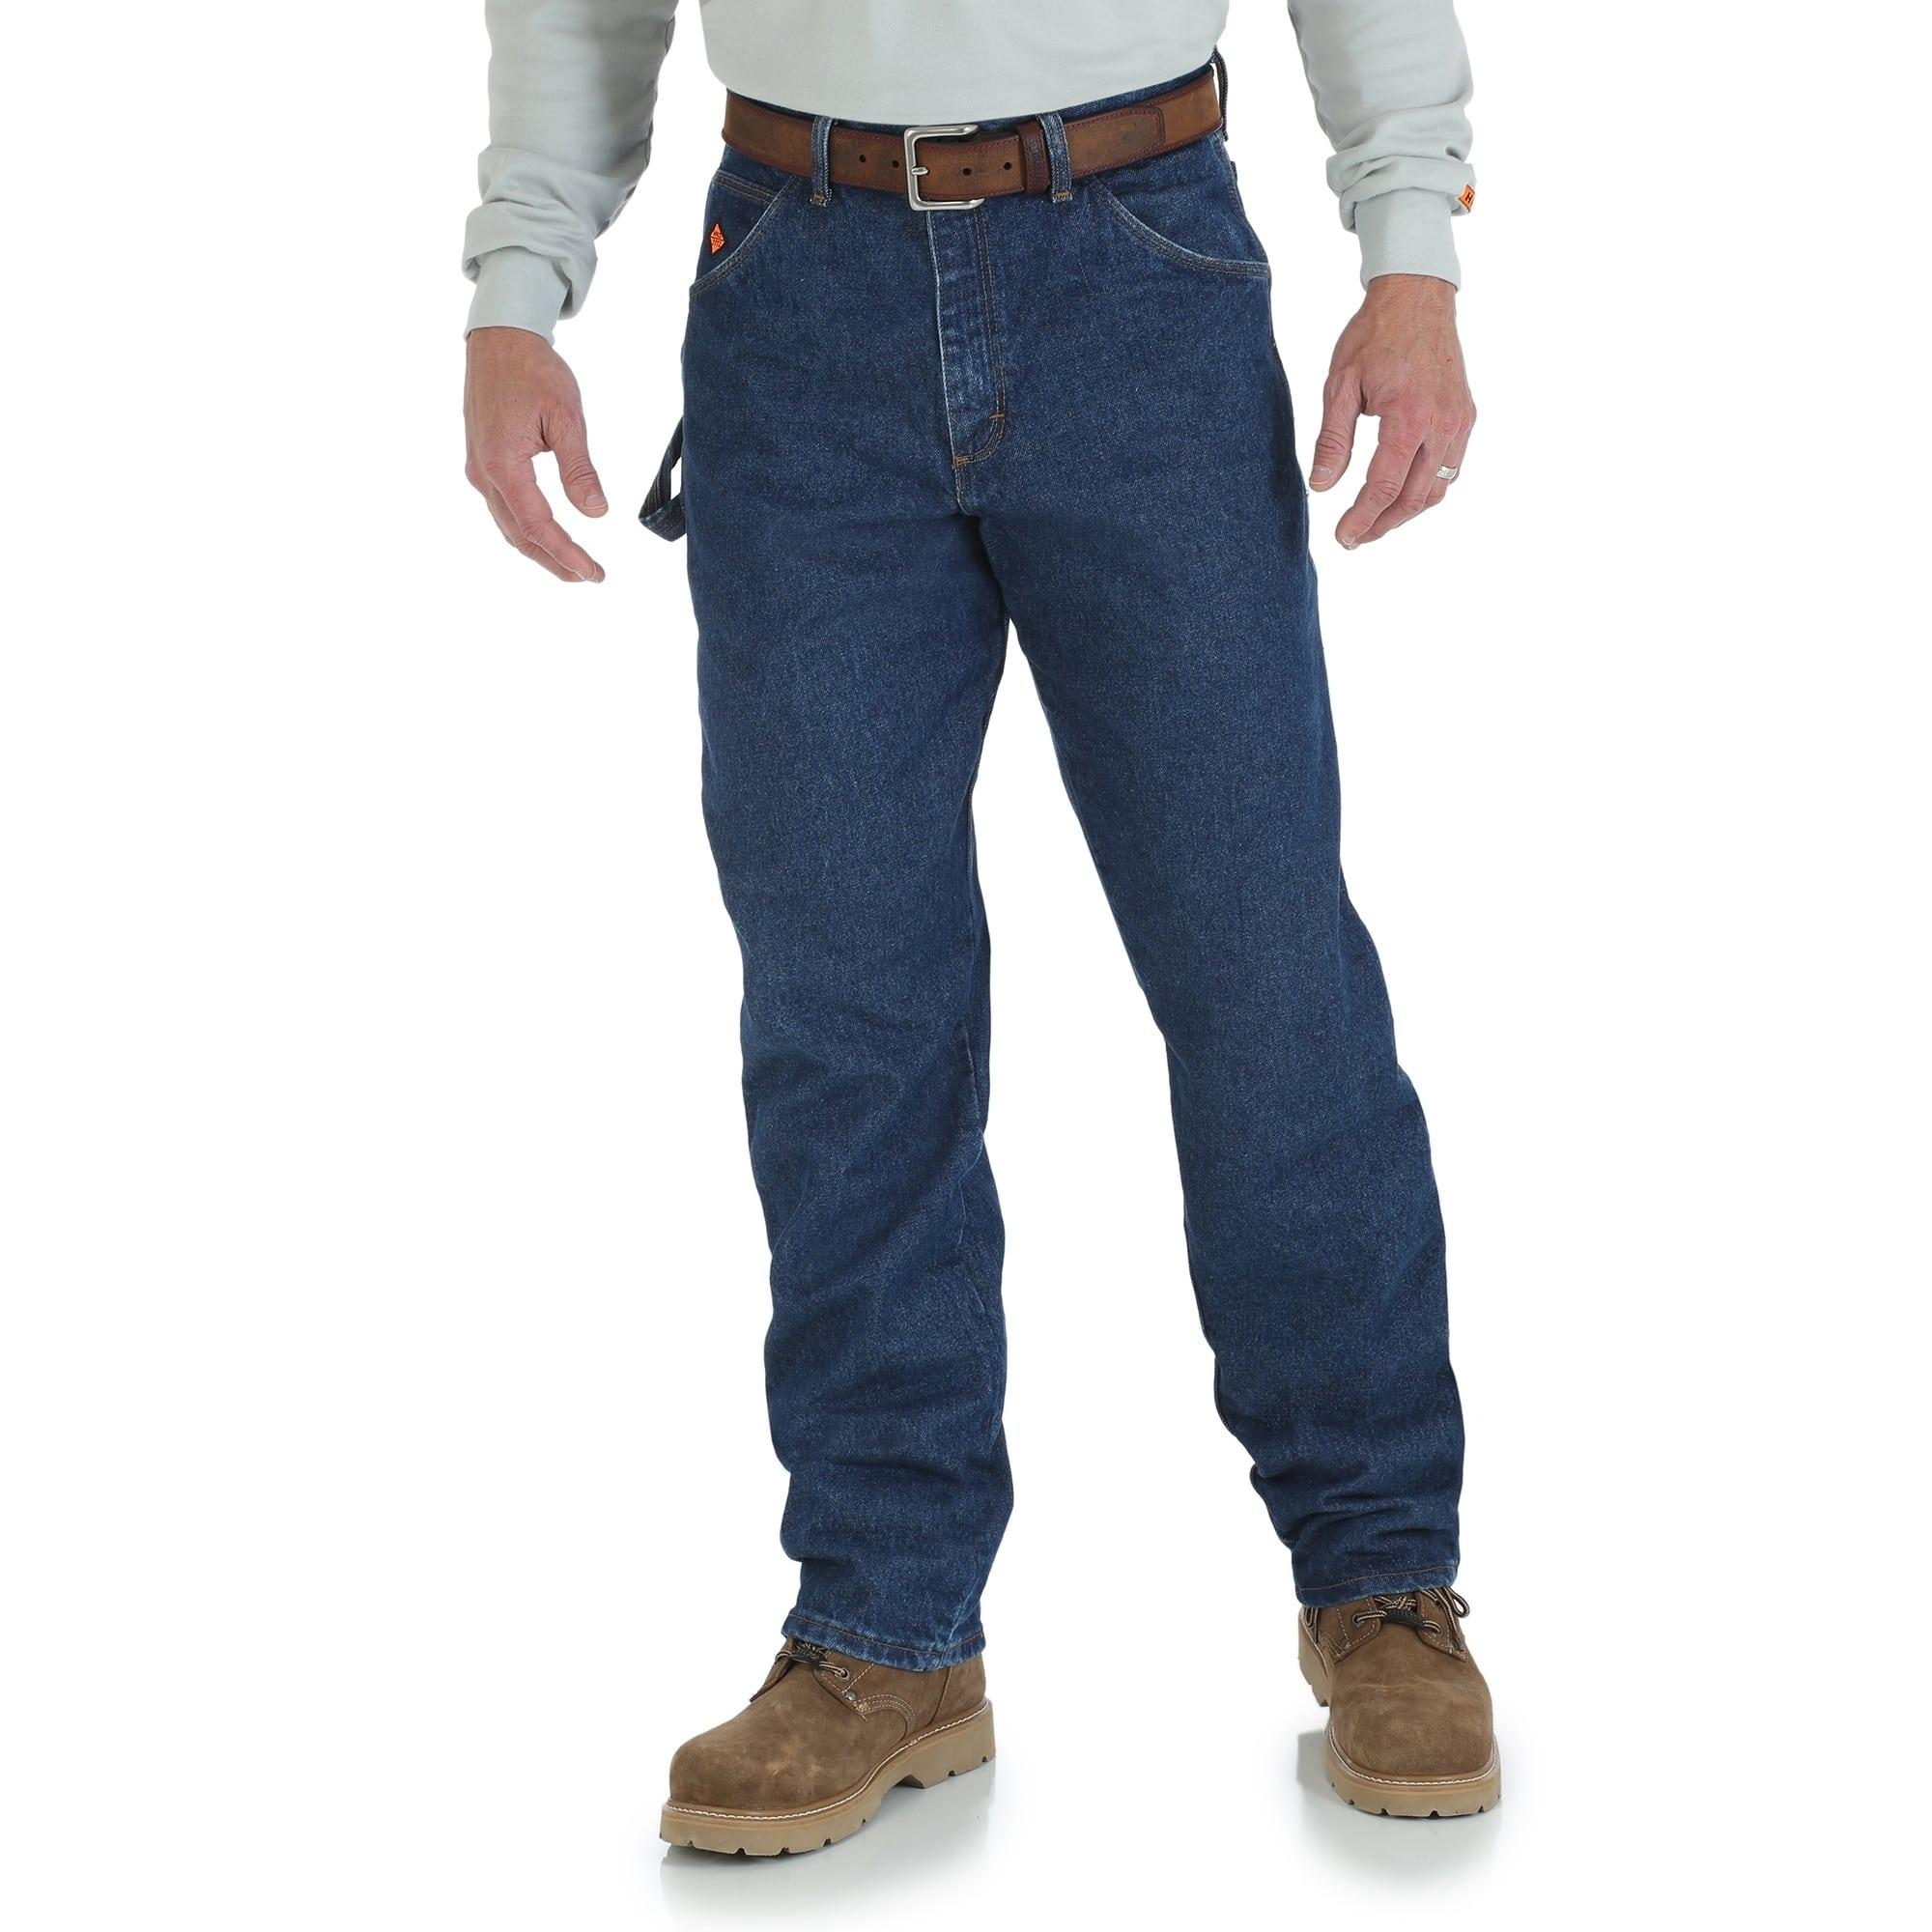 Mens Jeans 36 X 33